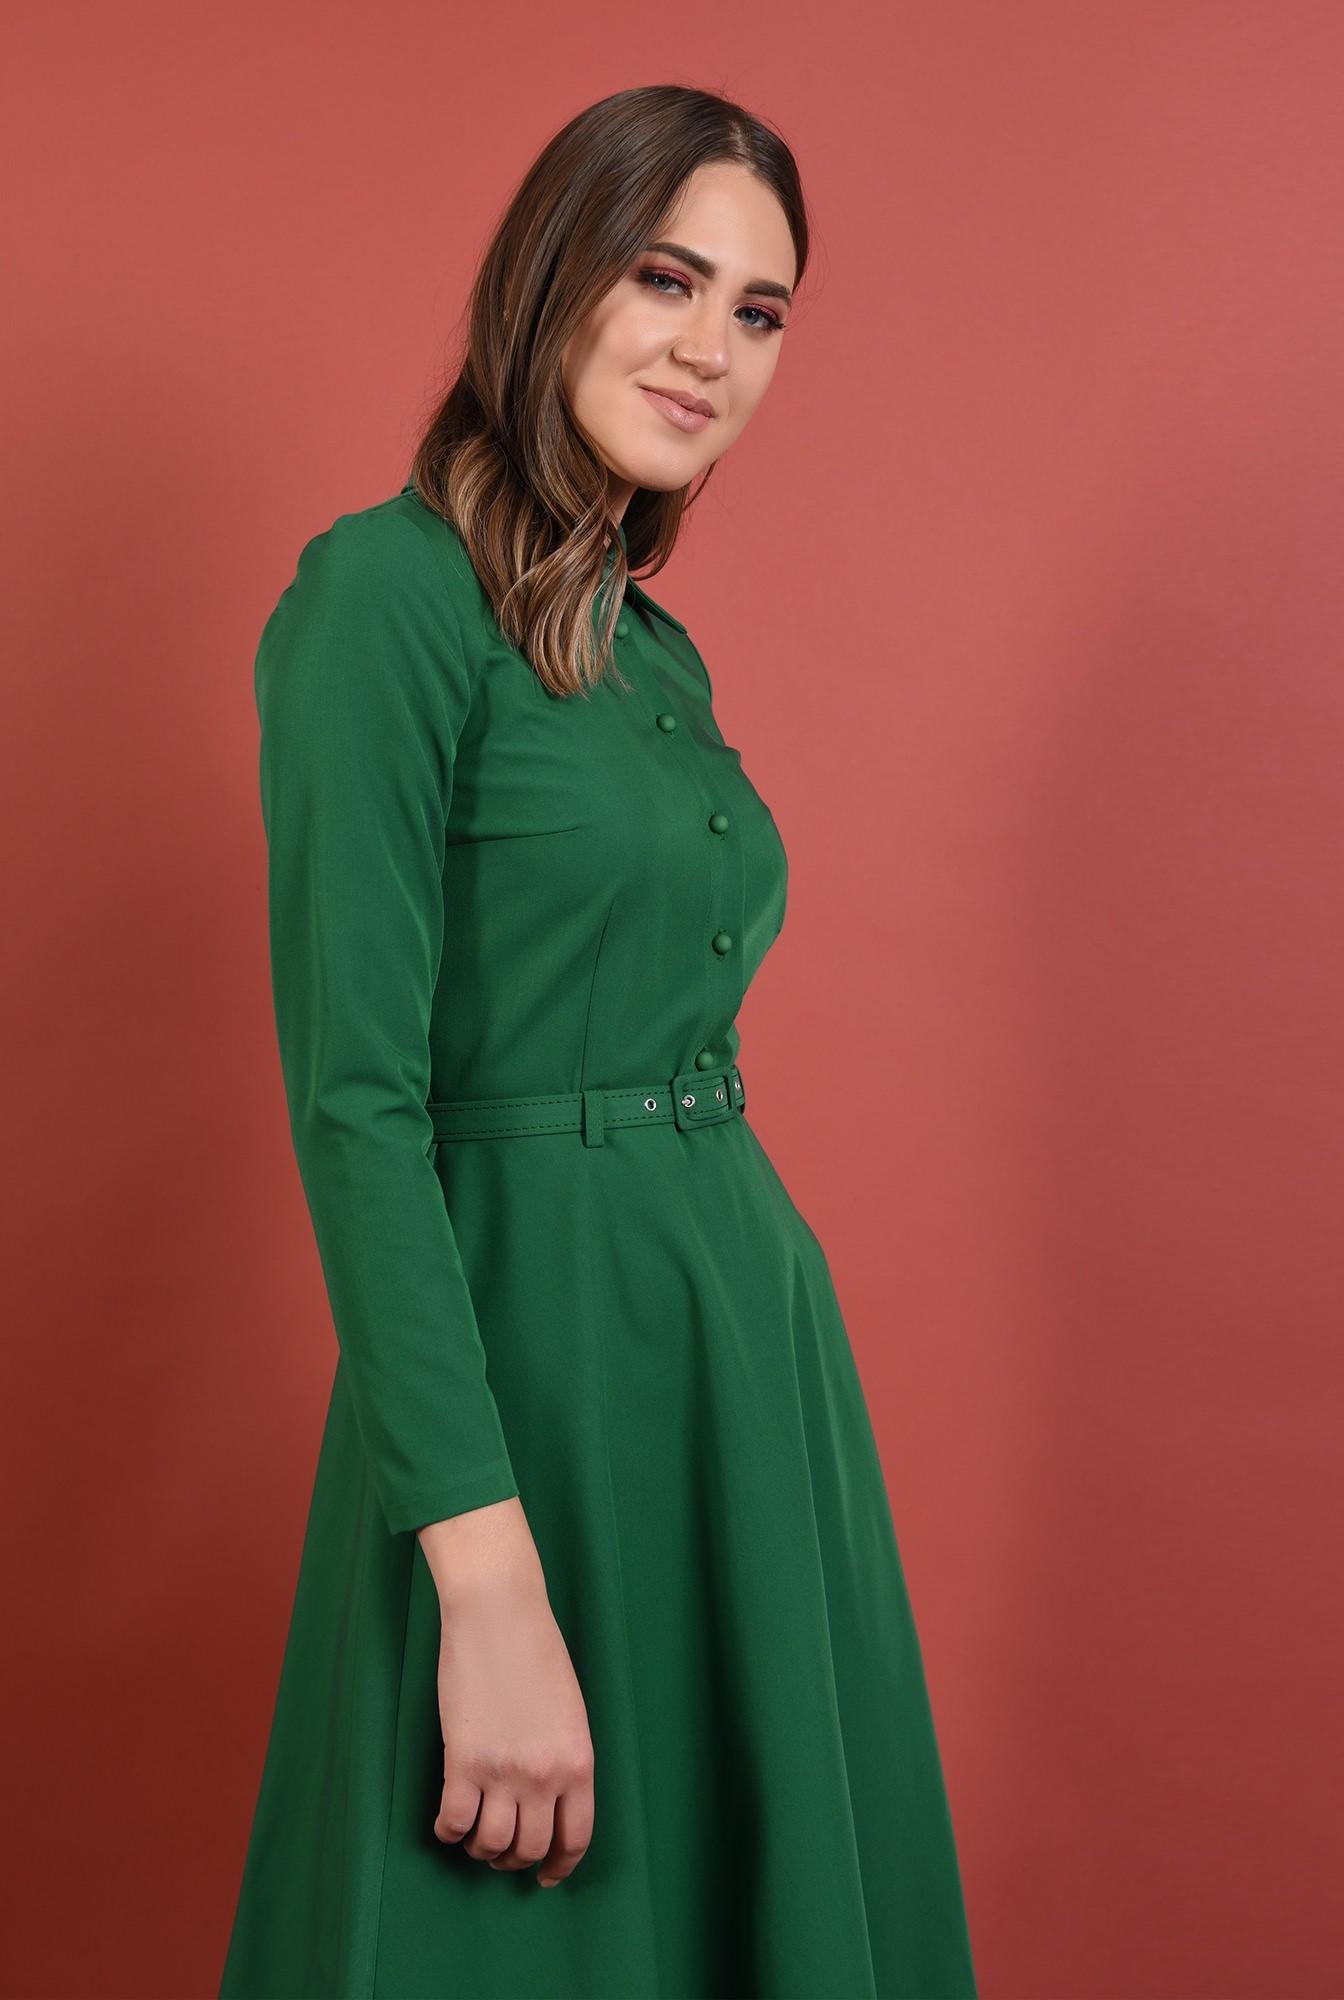 2 - 360 - rochie verde, office, midi, croi evazat, maneci lungi, curea, Poema